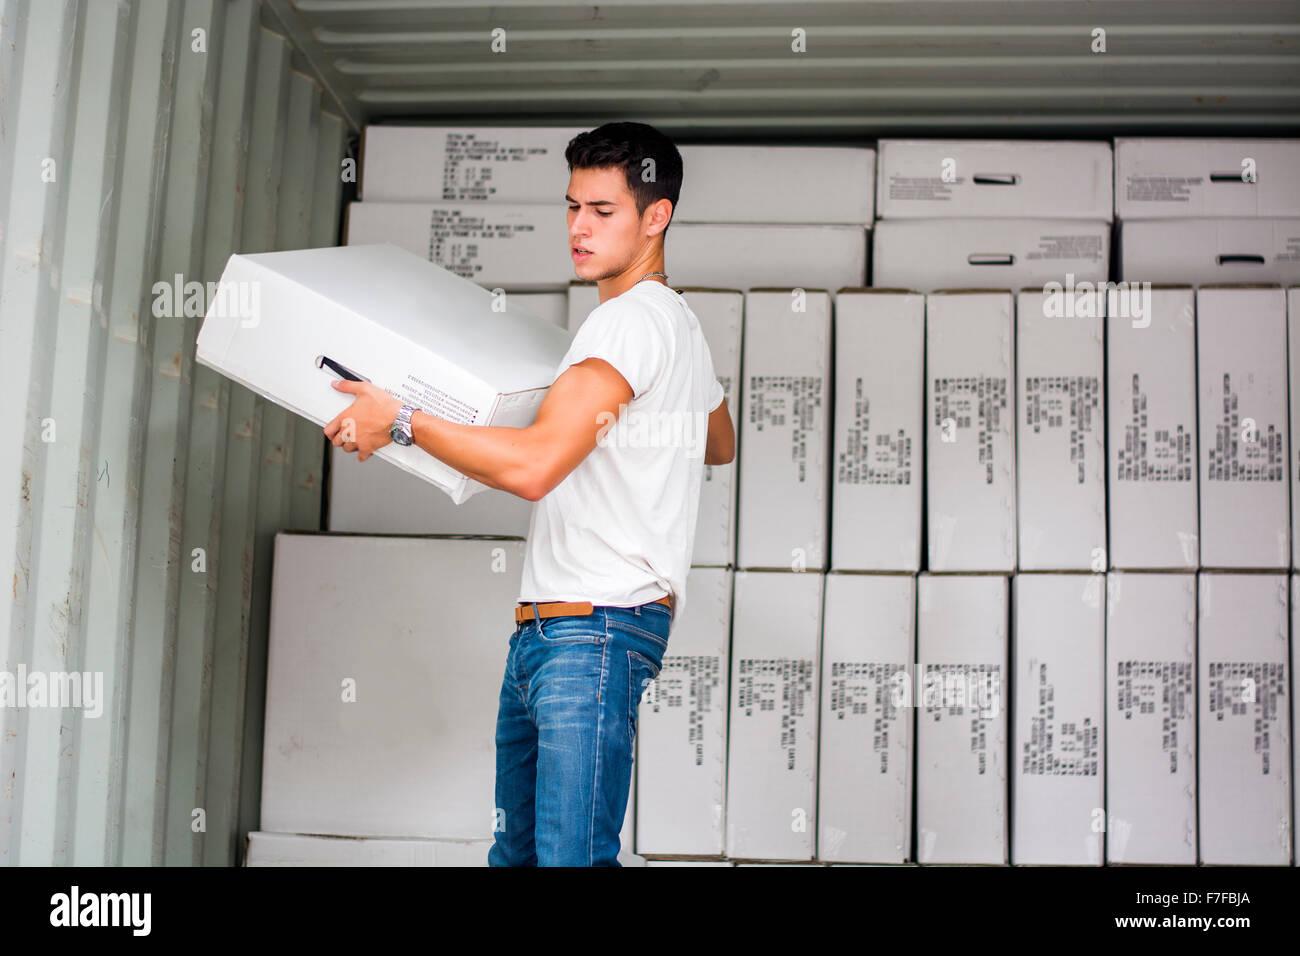 Waist Up Portrait of Young Smiling Man Holding Large White fort à côté de Freight Train Voiture  Photo Stock